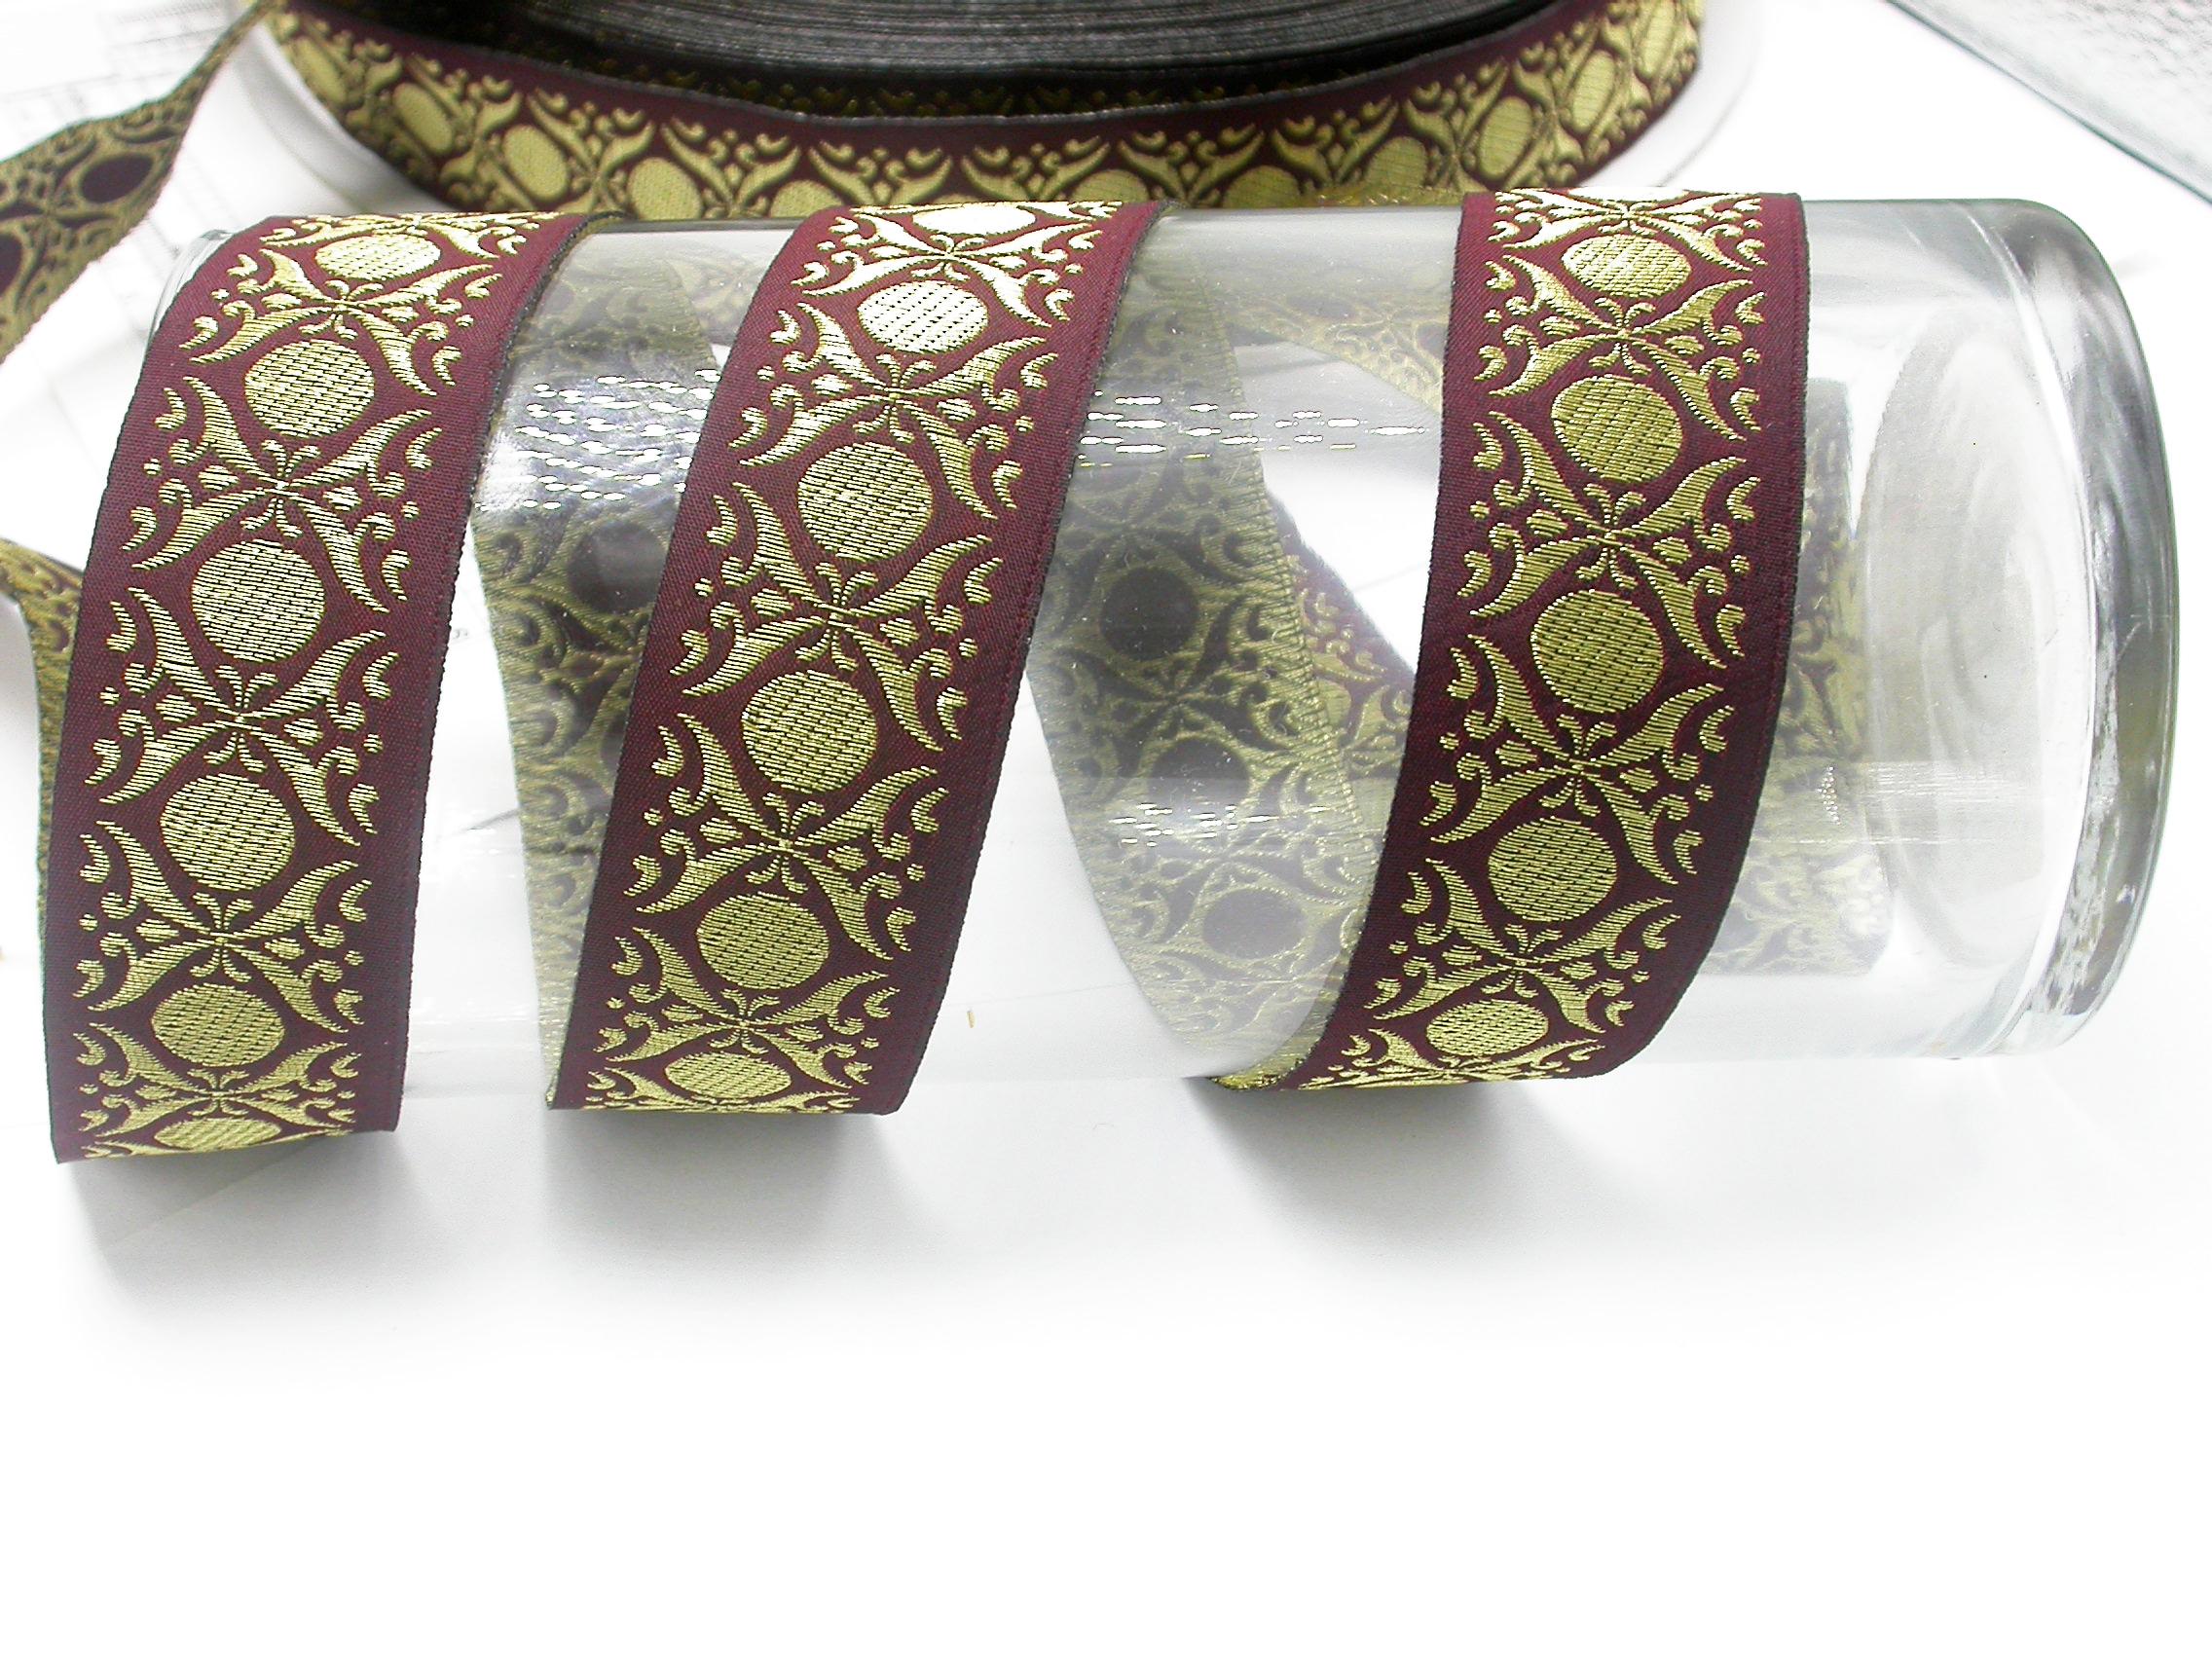 "Jacquard Ribbon Tzia 1 5/16"" (34mm) Metallic Gold Priced Per Yard"